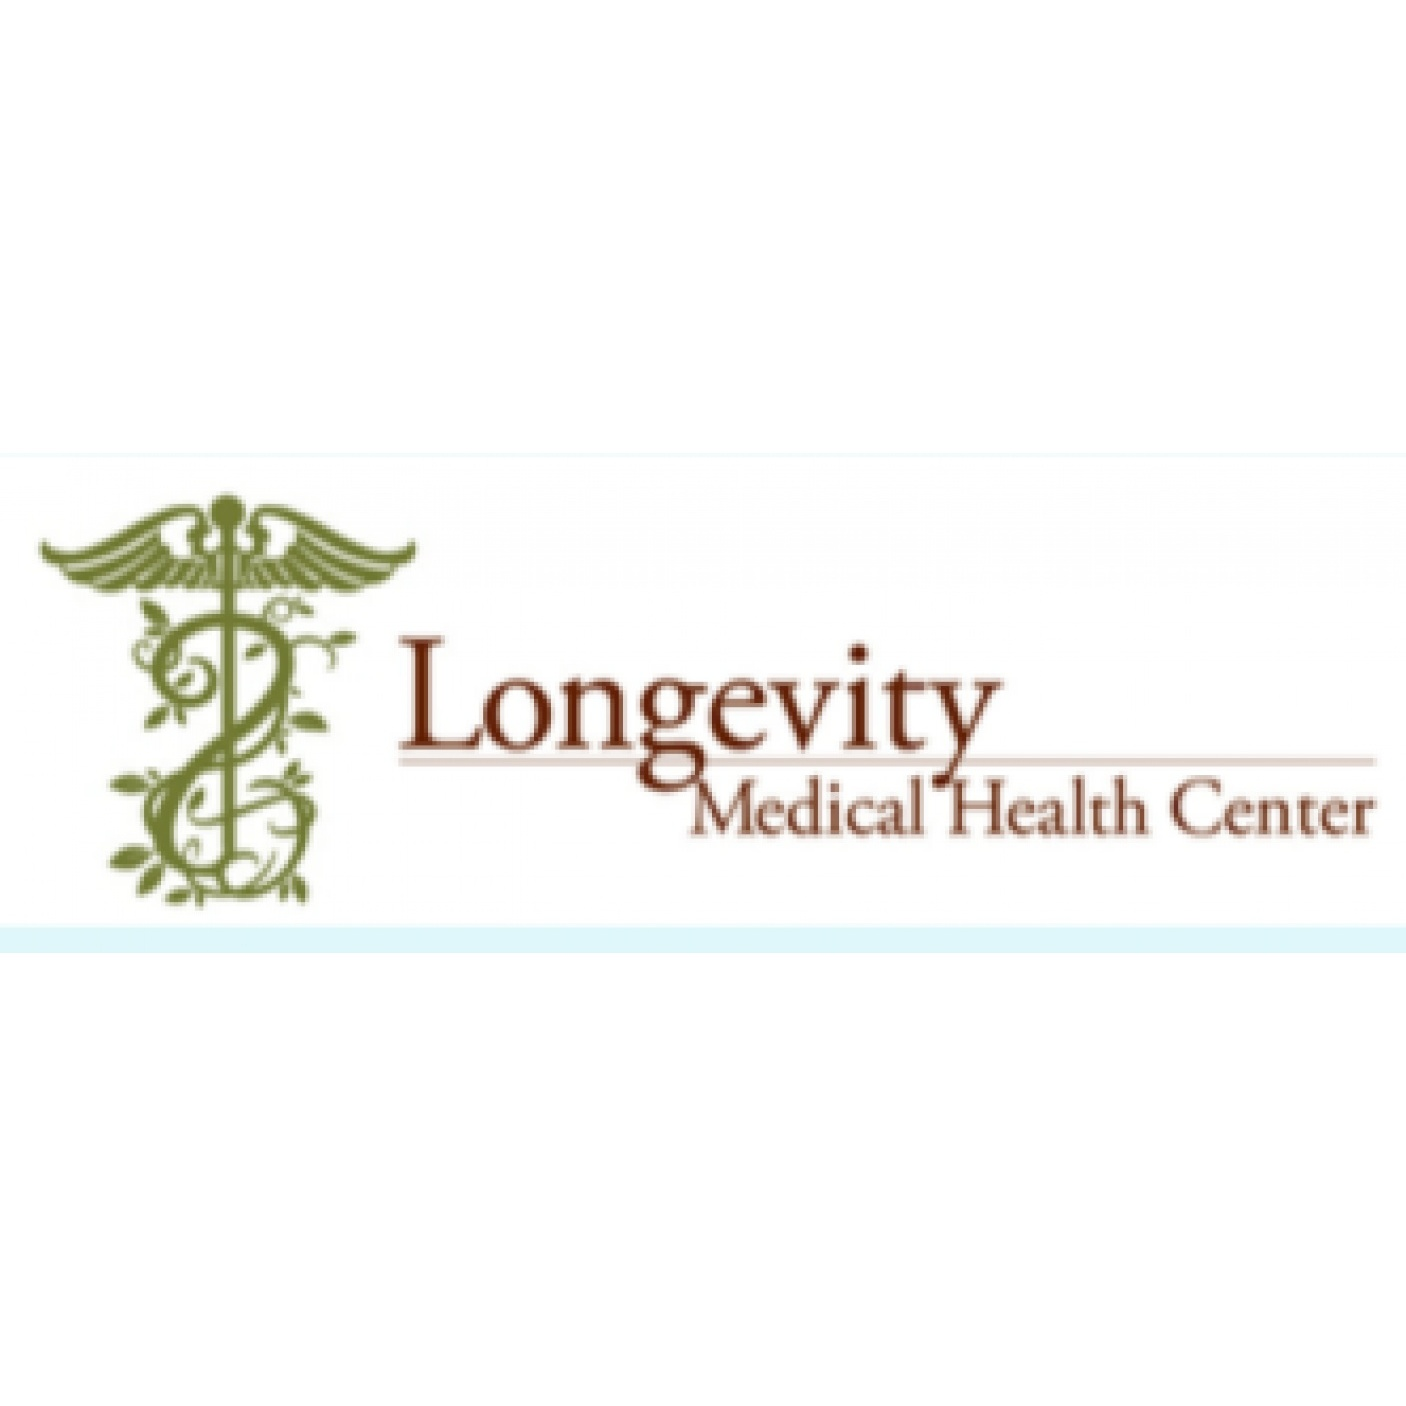 Longevity Medical Health Center